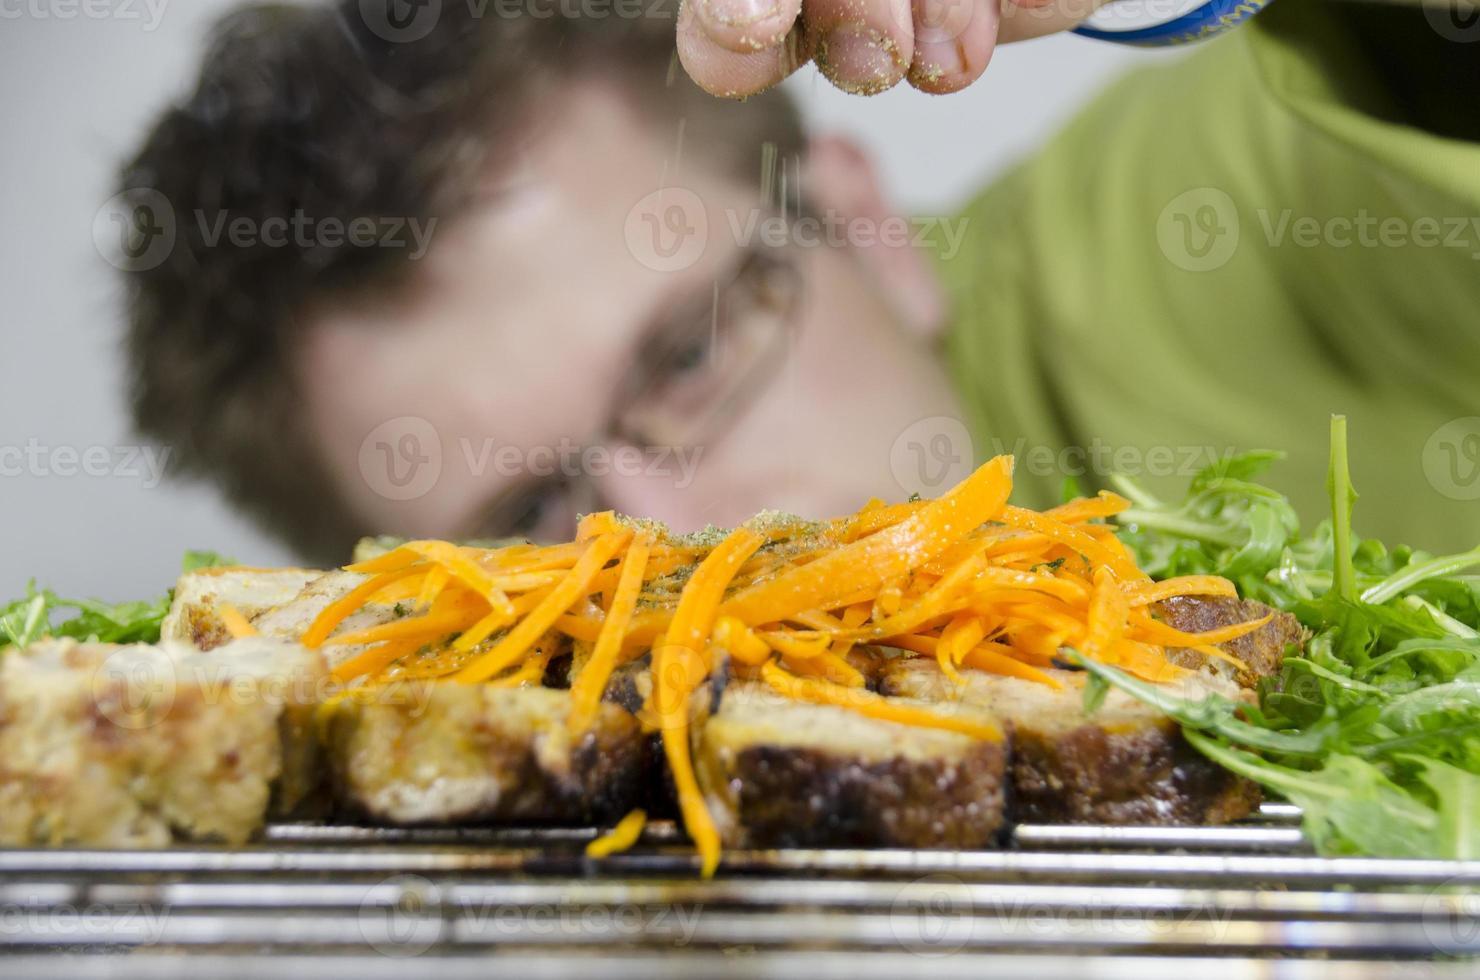 professionell kock foto